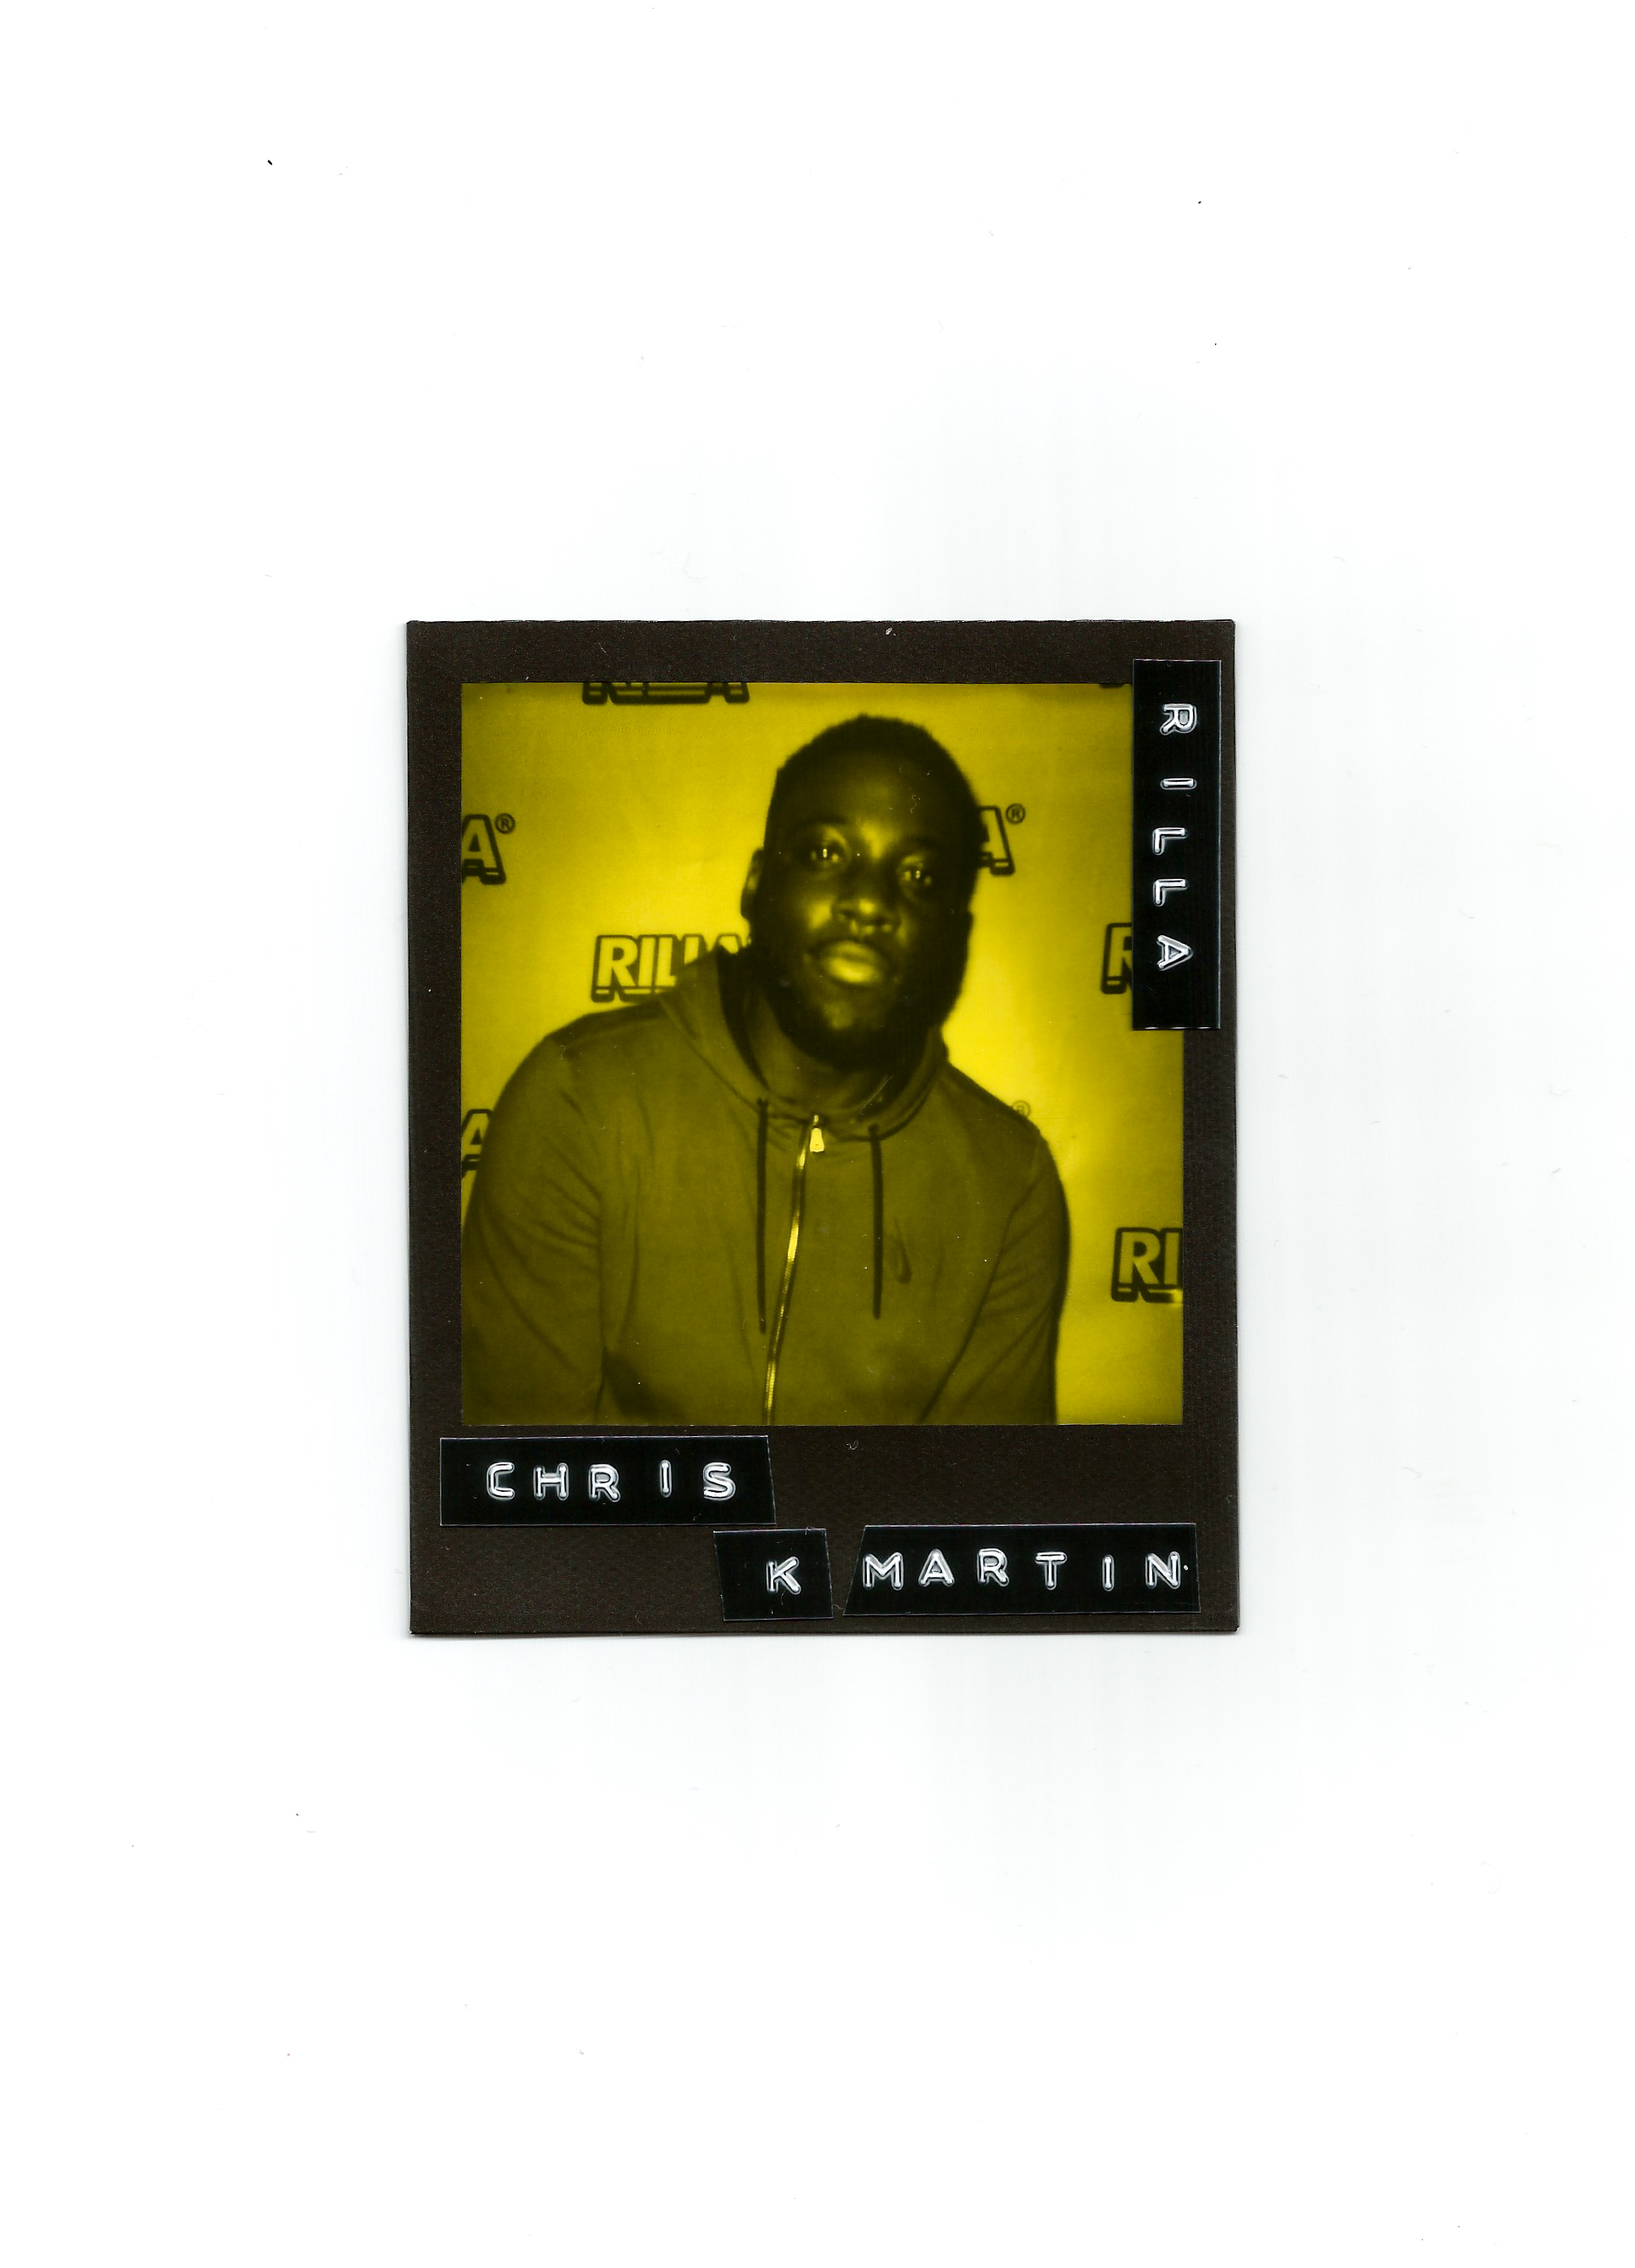 CHRIS K MARTIN